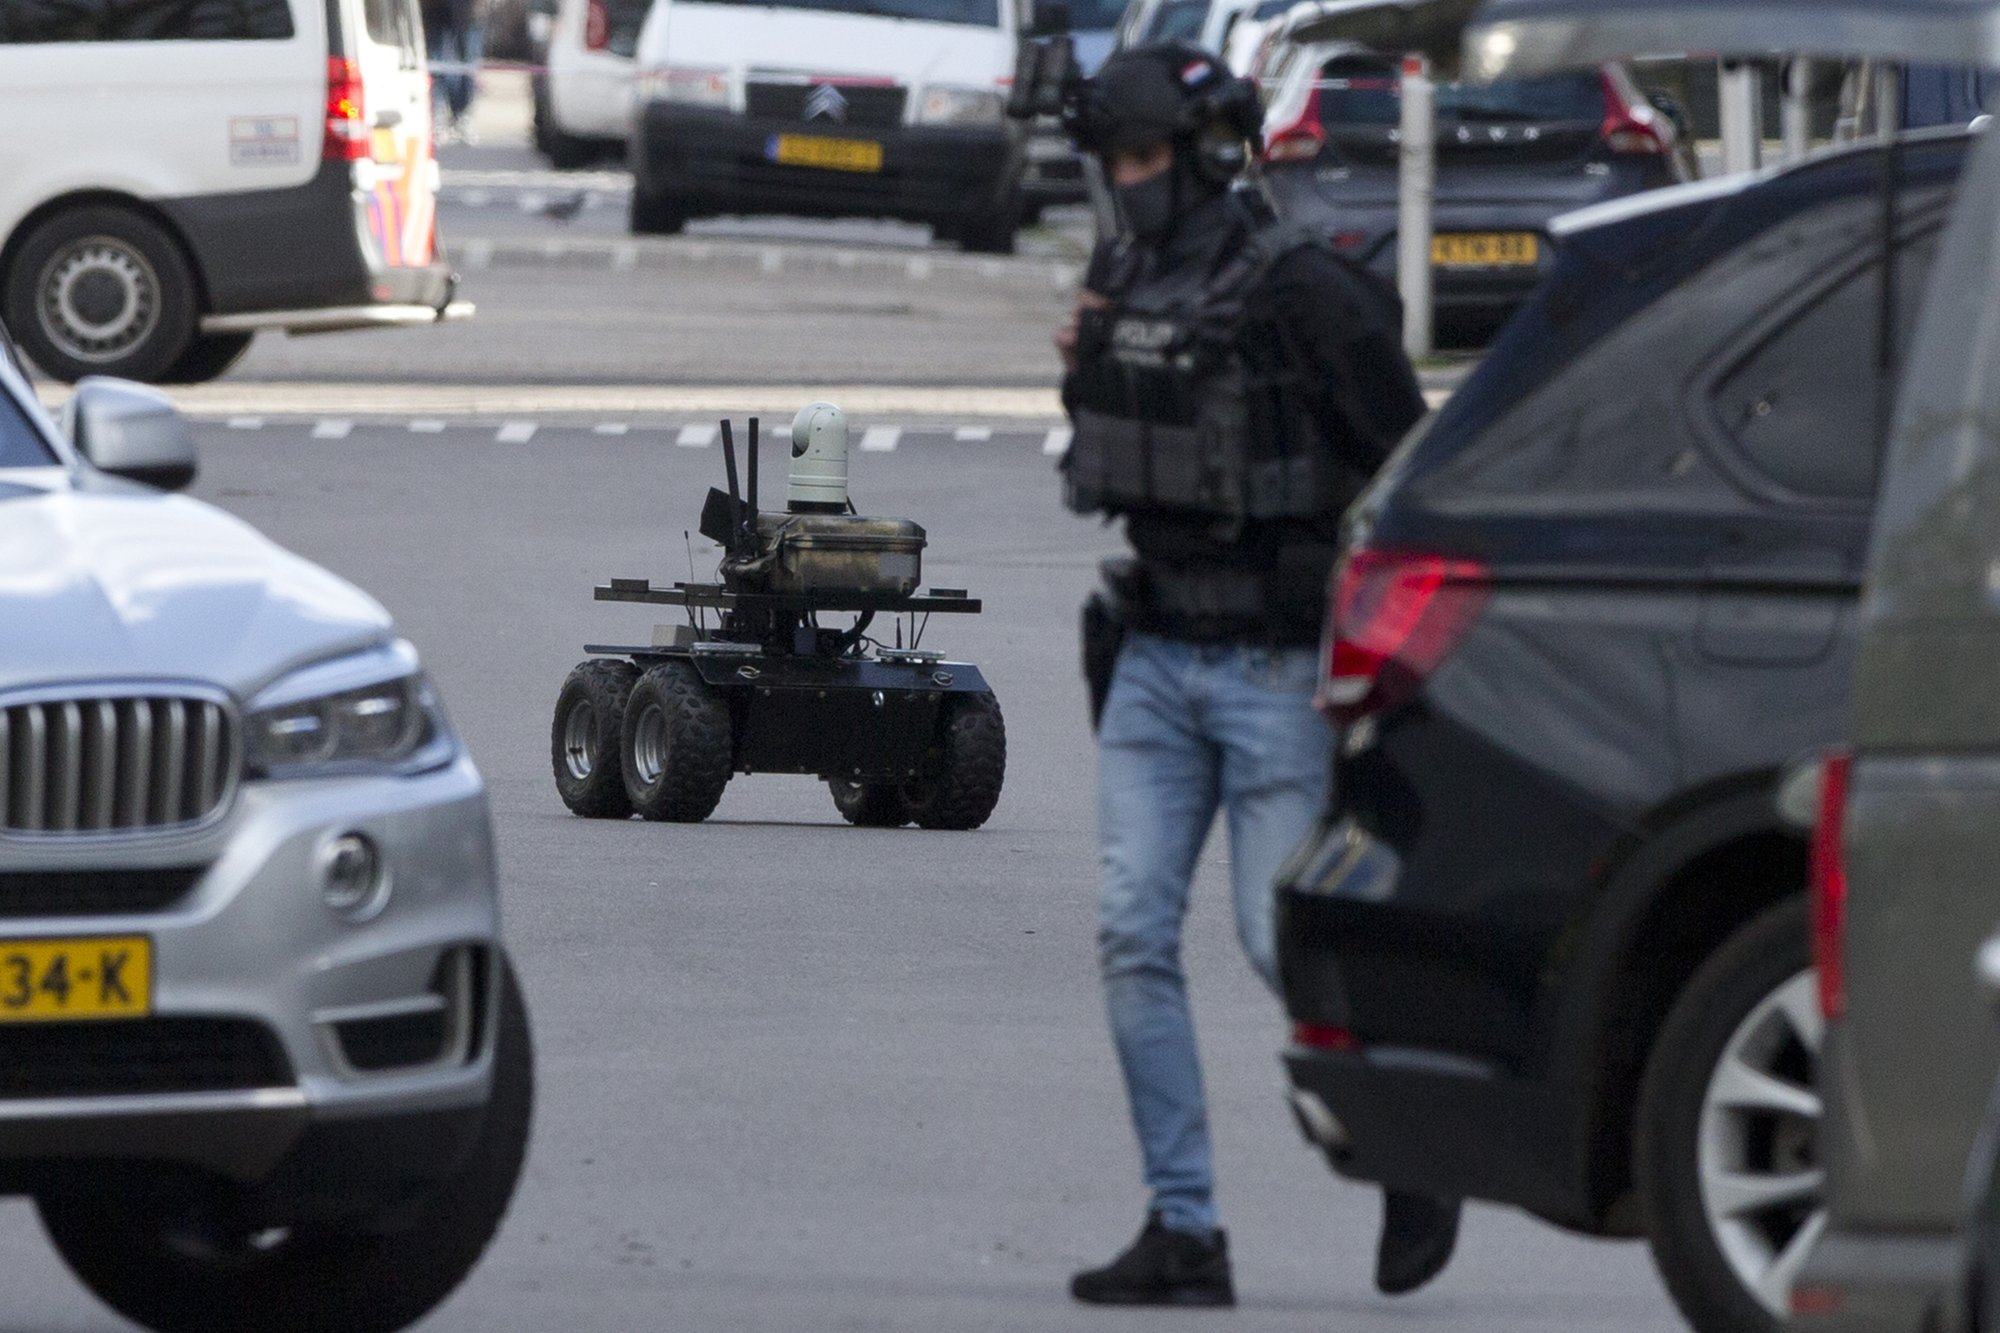 Gunman kills 3 on Dutch tram; mayor fears terrorism